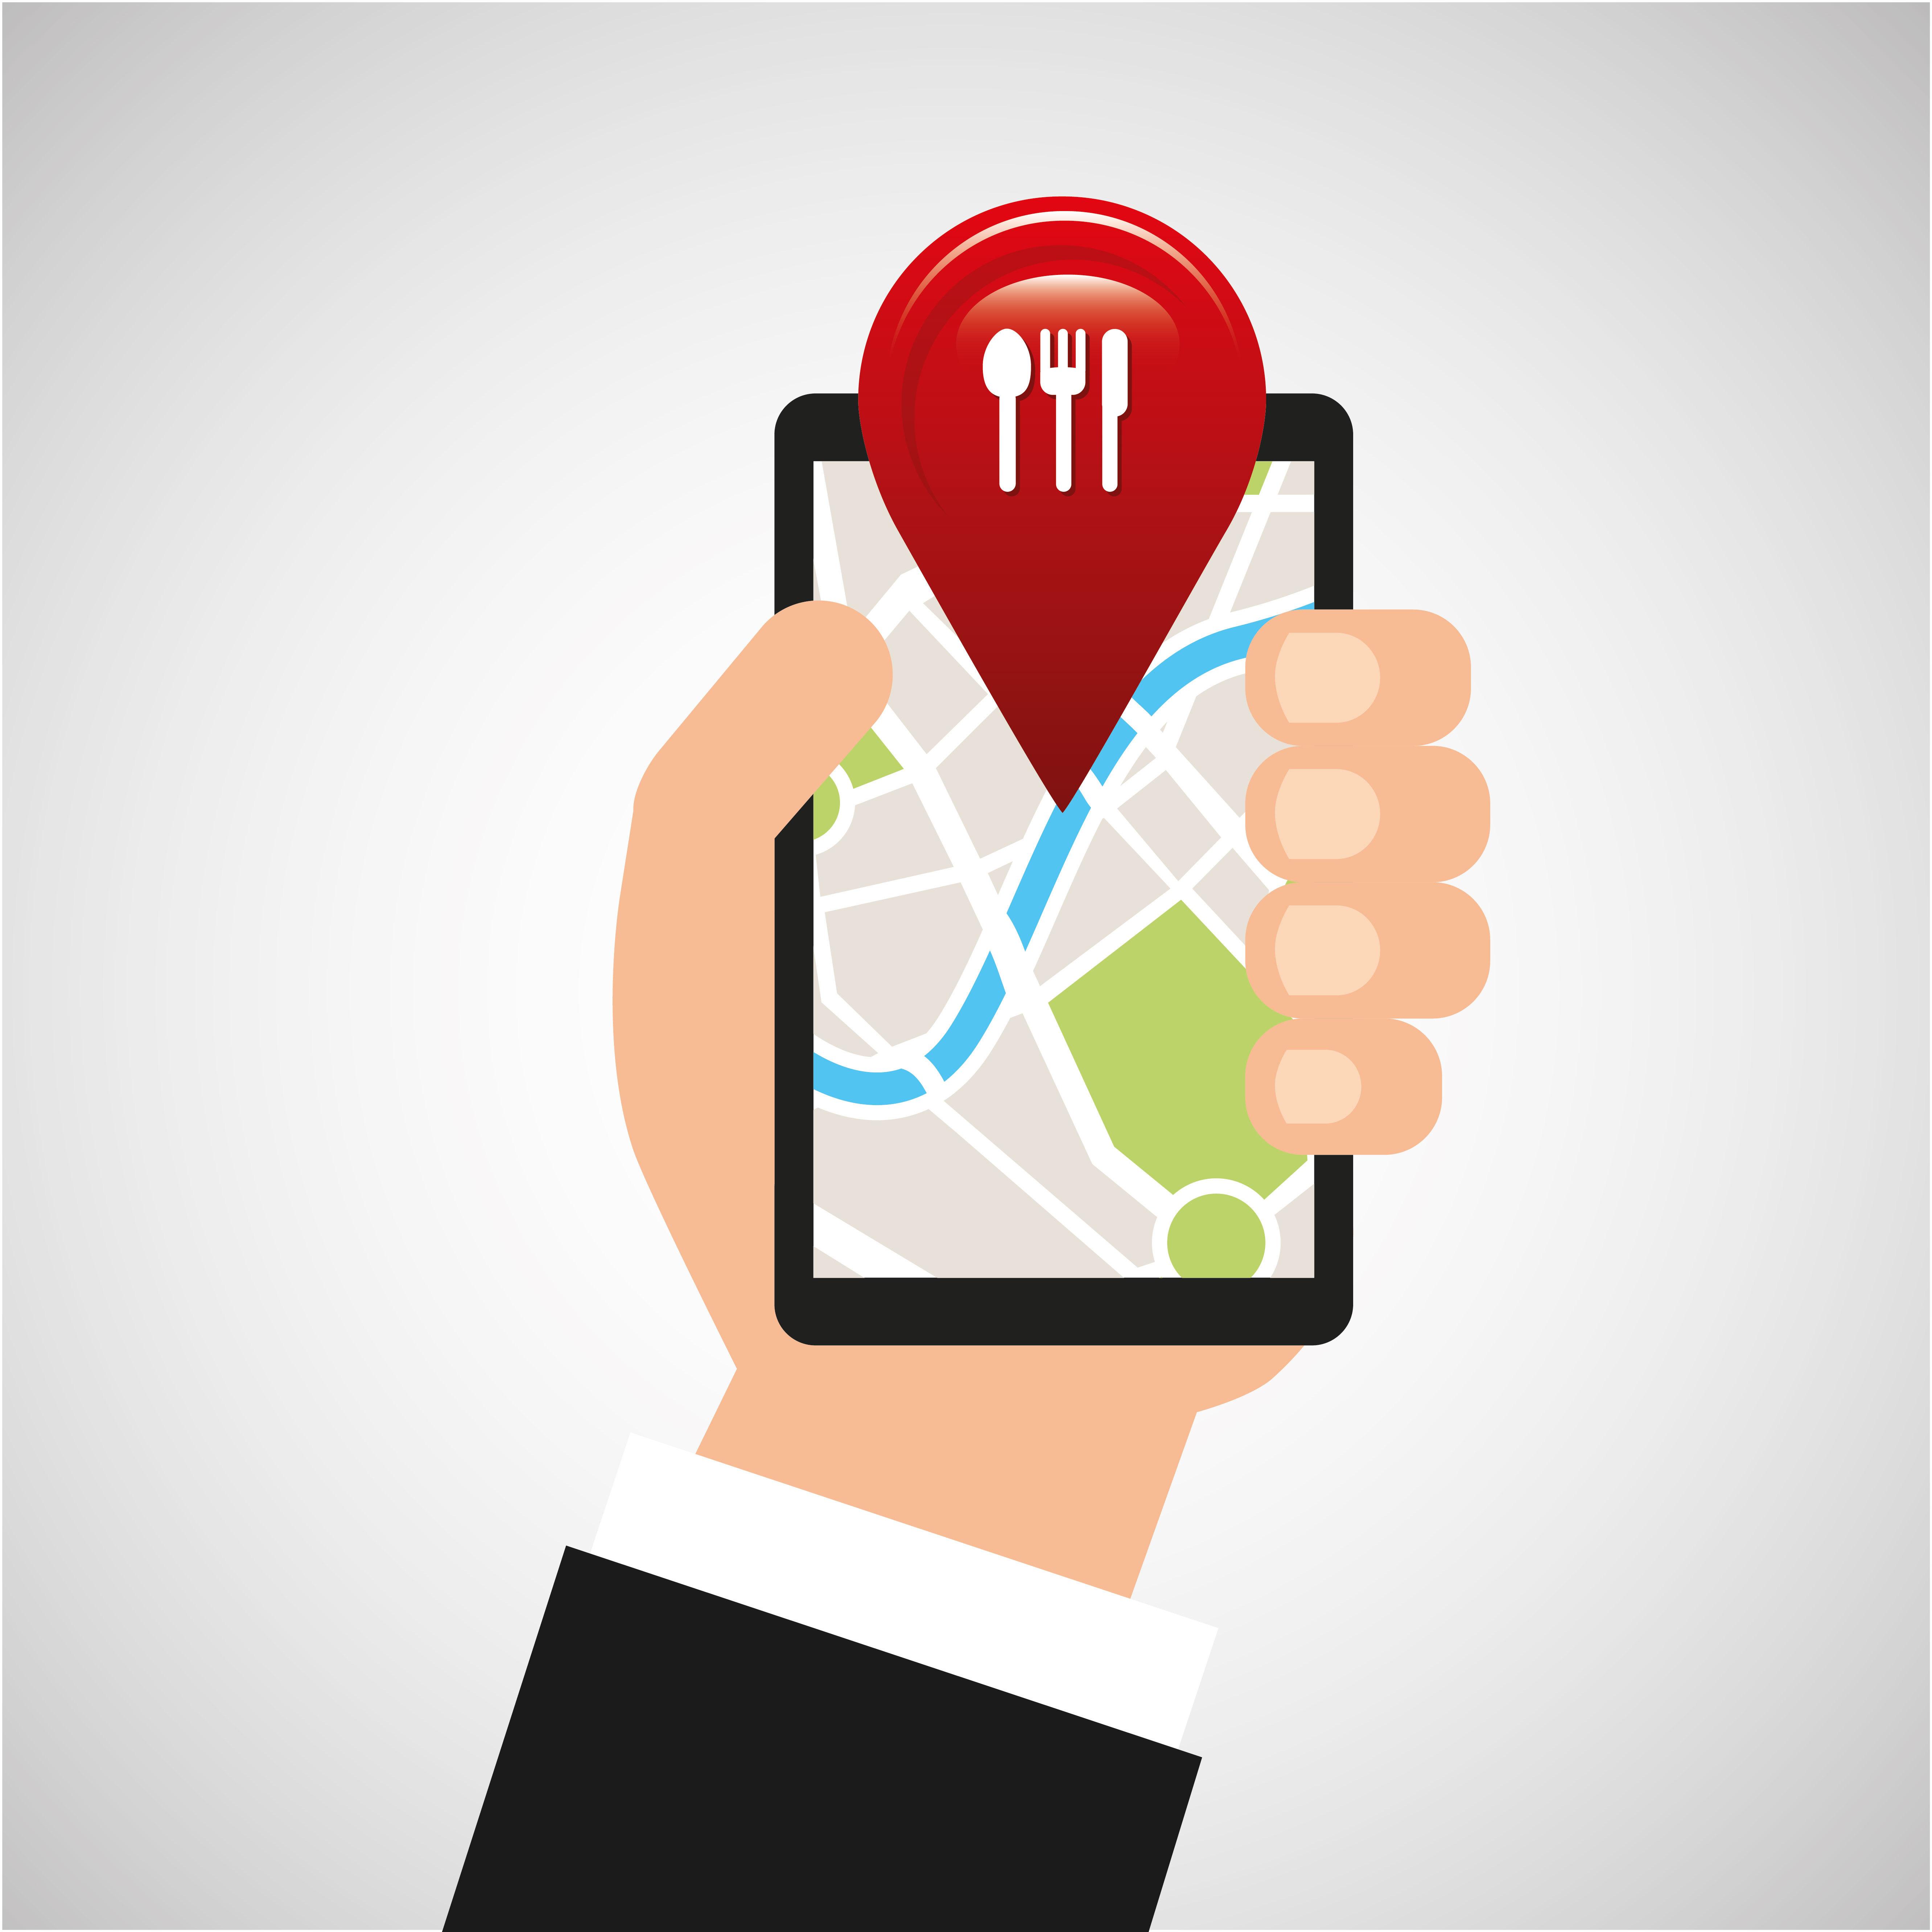 How To Build A Restaurant App